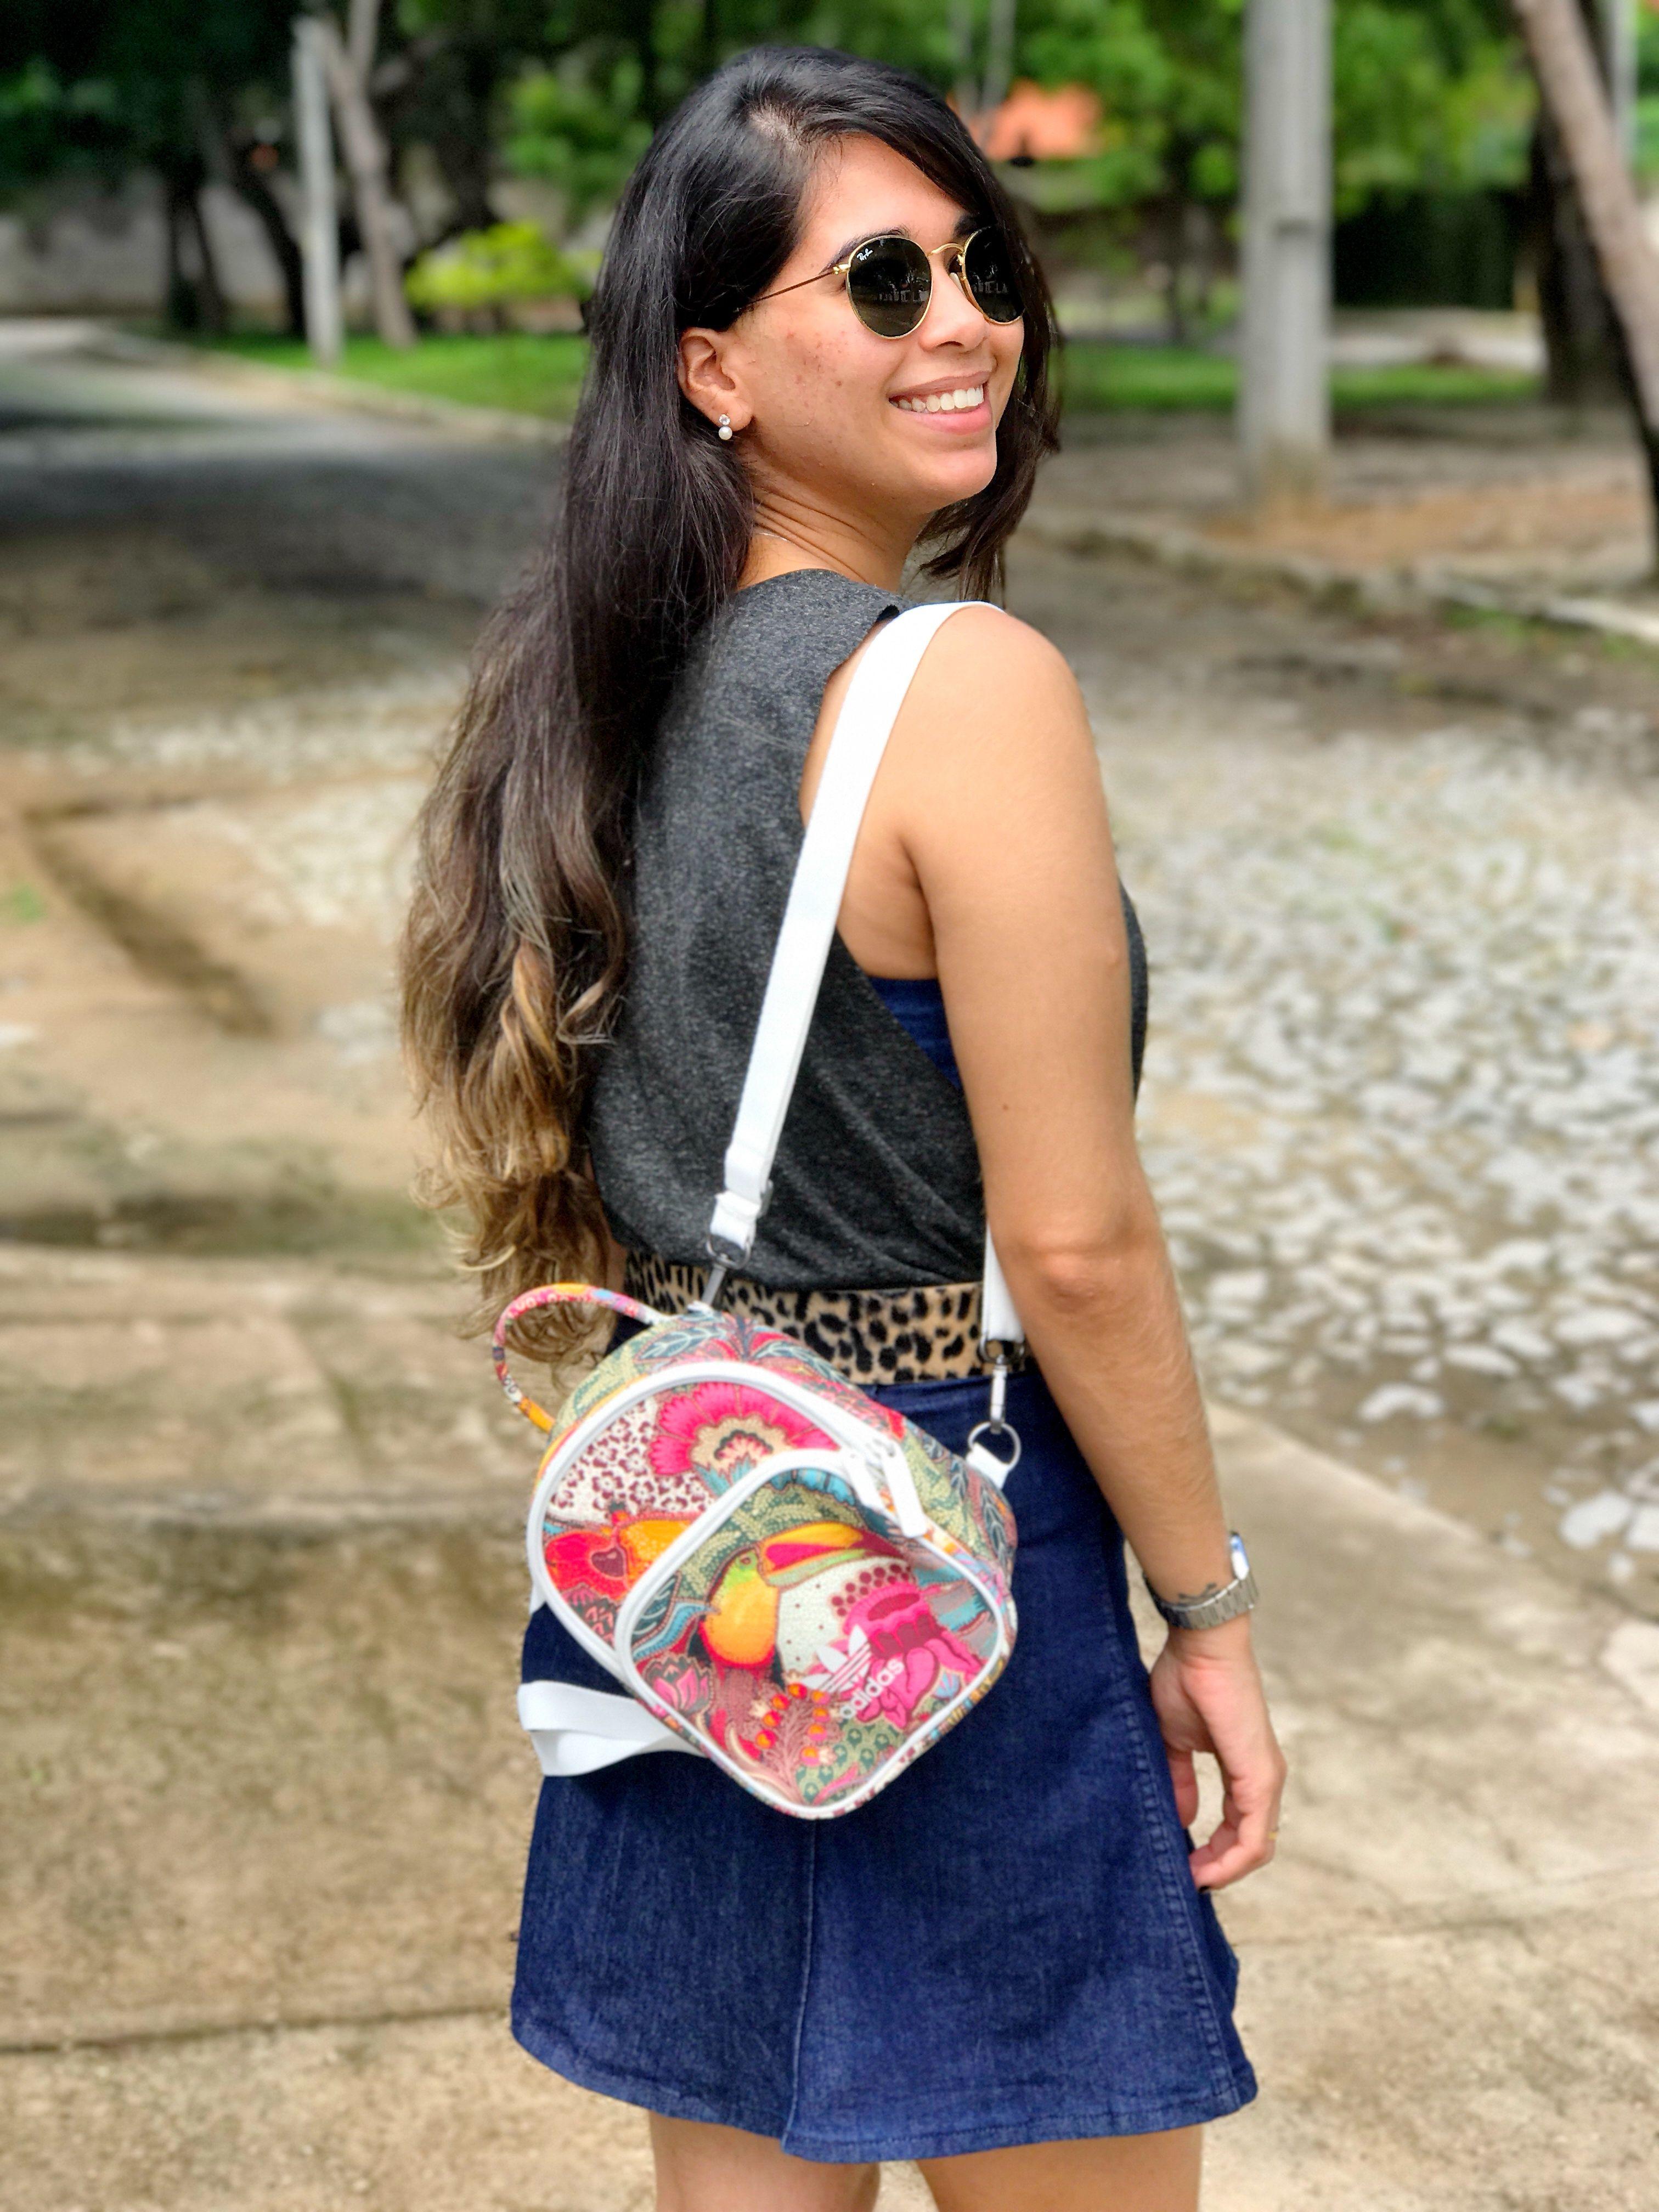 f40fde2cc Mochila Mini Adidas parceria com a Farm | Fashion | Bags, Shoulder ...